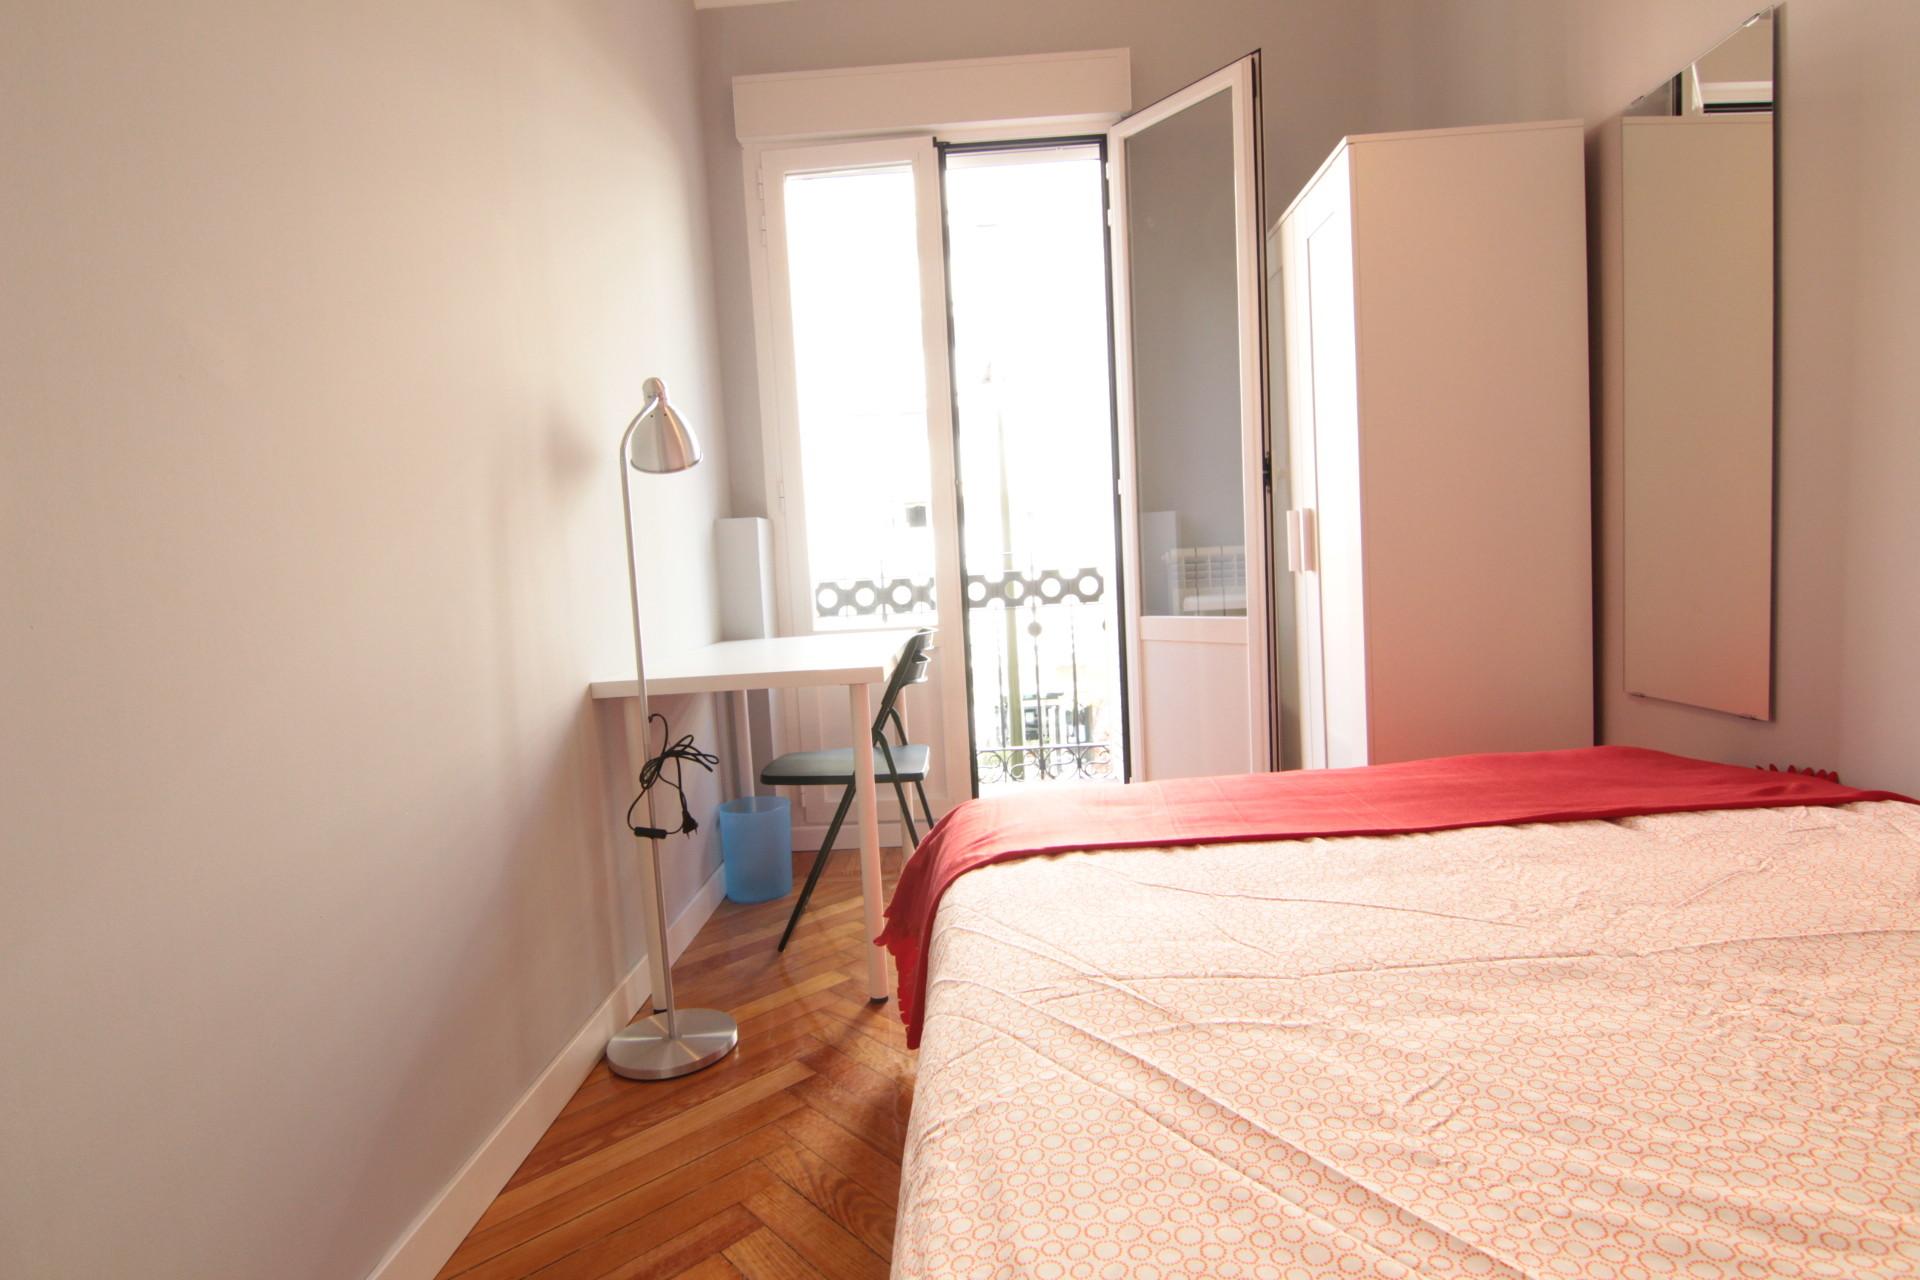 alquiler-habitacion-calle-goya-5f52bb2dc0723233b02daba875983080